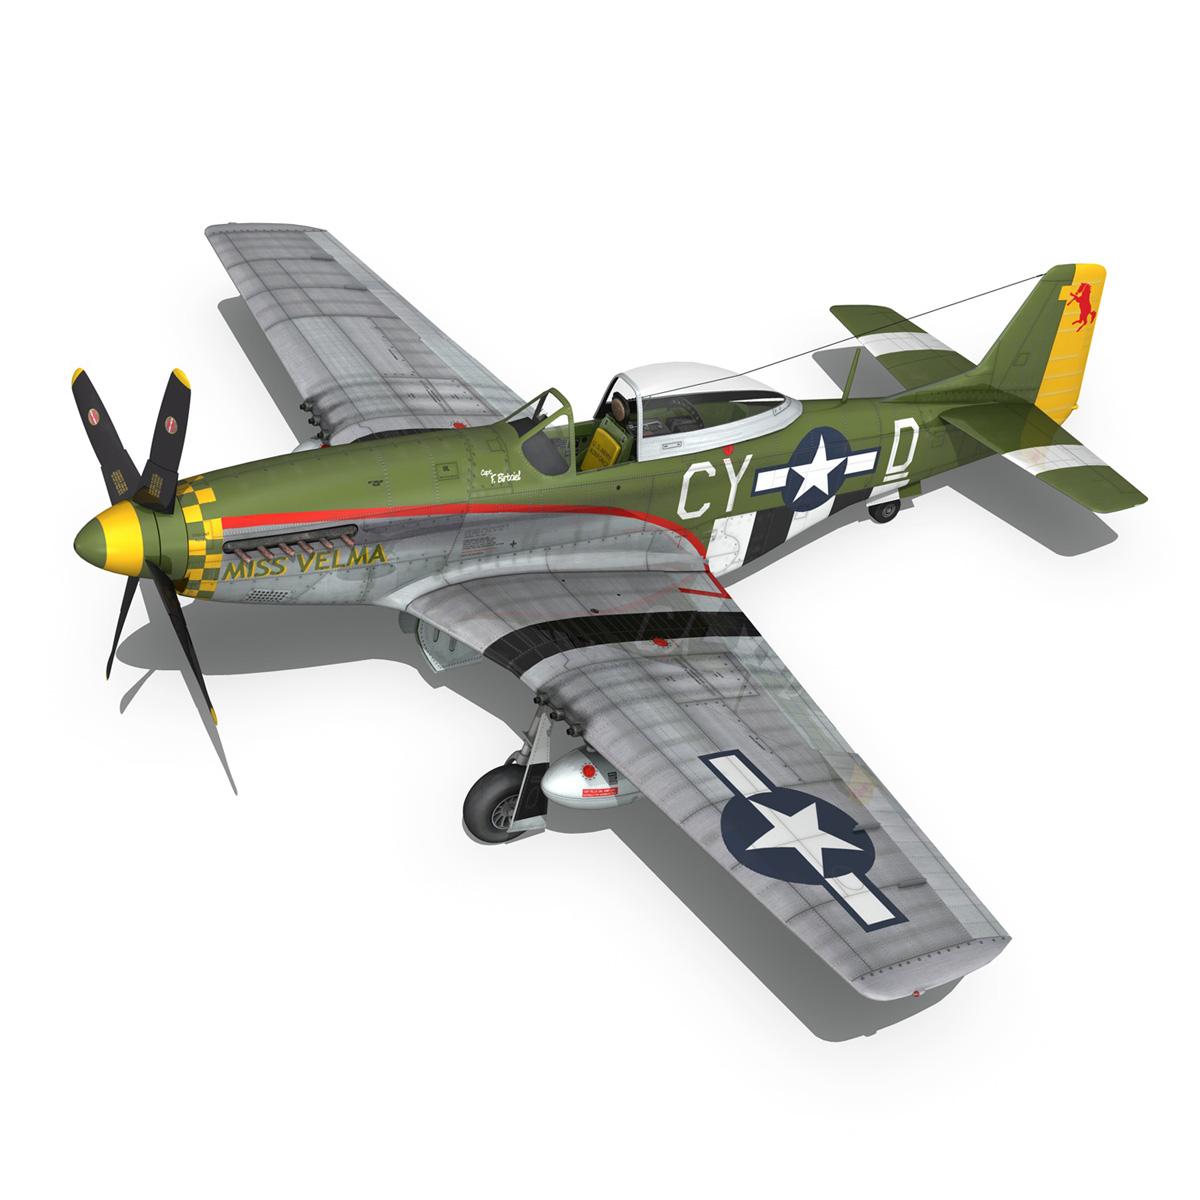 north american p-51d – mustang – miss velma 3d model 3ds fbx c4d lwo obj 267626